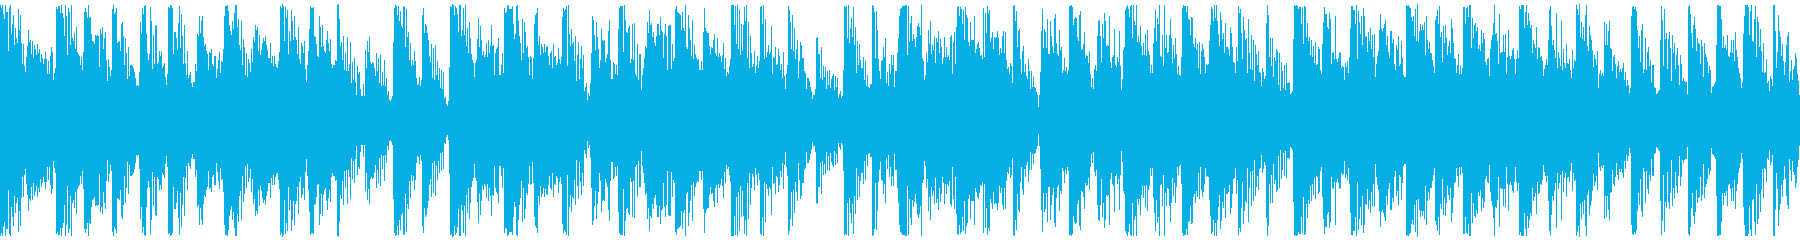 Chorus & band heartwarming short loop's reproduced waveform